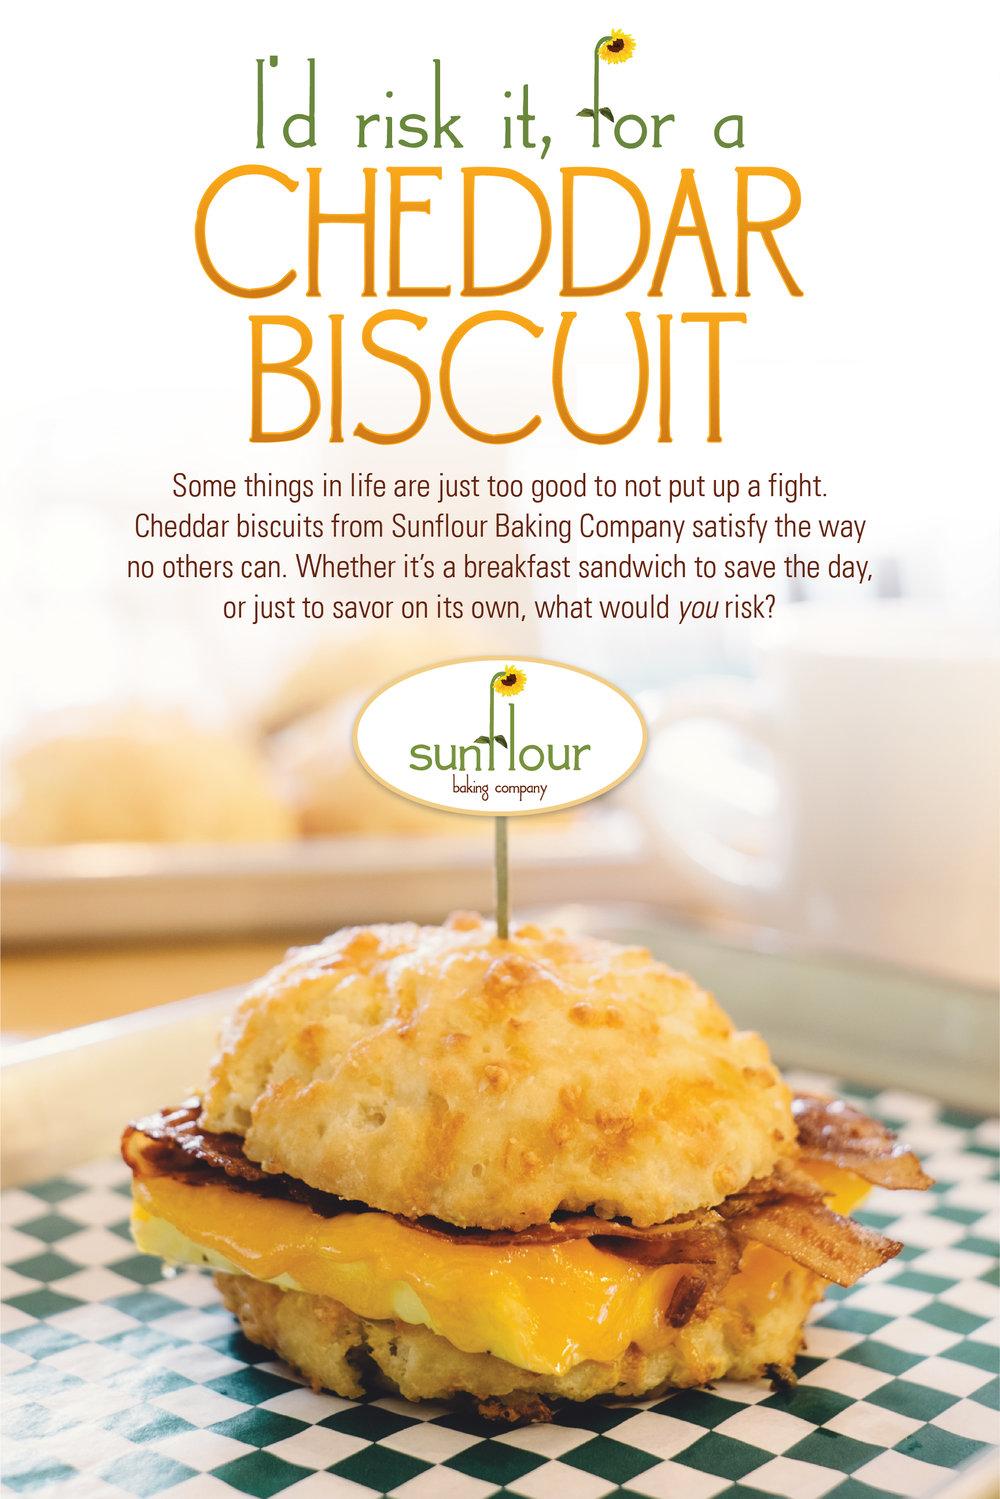 Sunflour Cheddar Biscuit Poster Design_Portrait.jpg